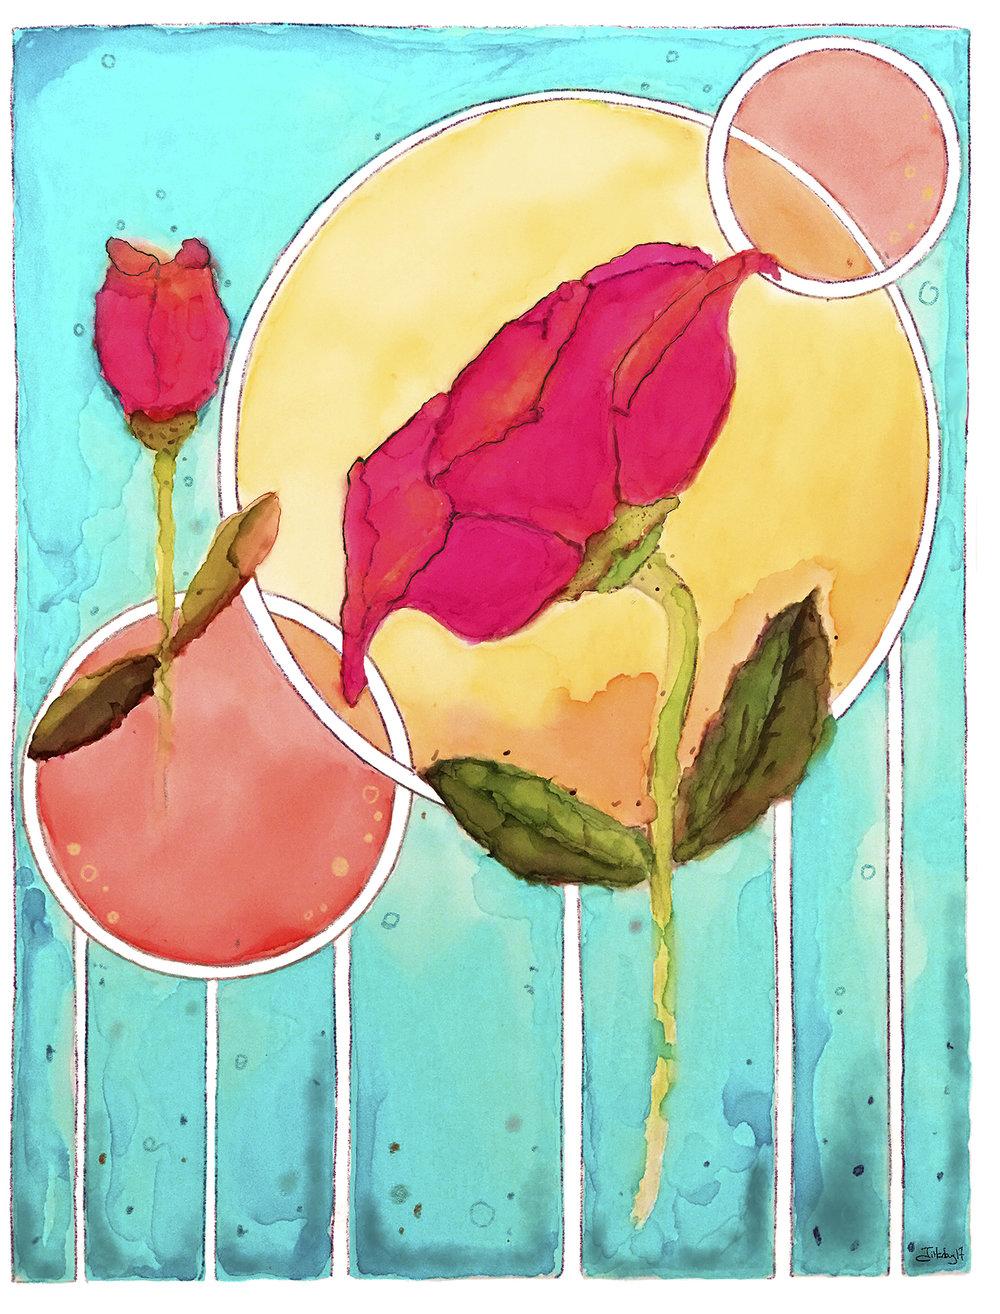 book rose moon.jpg